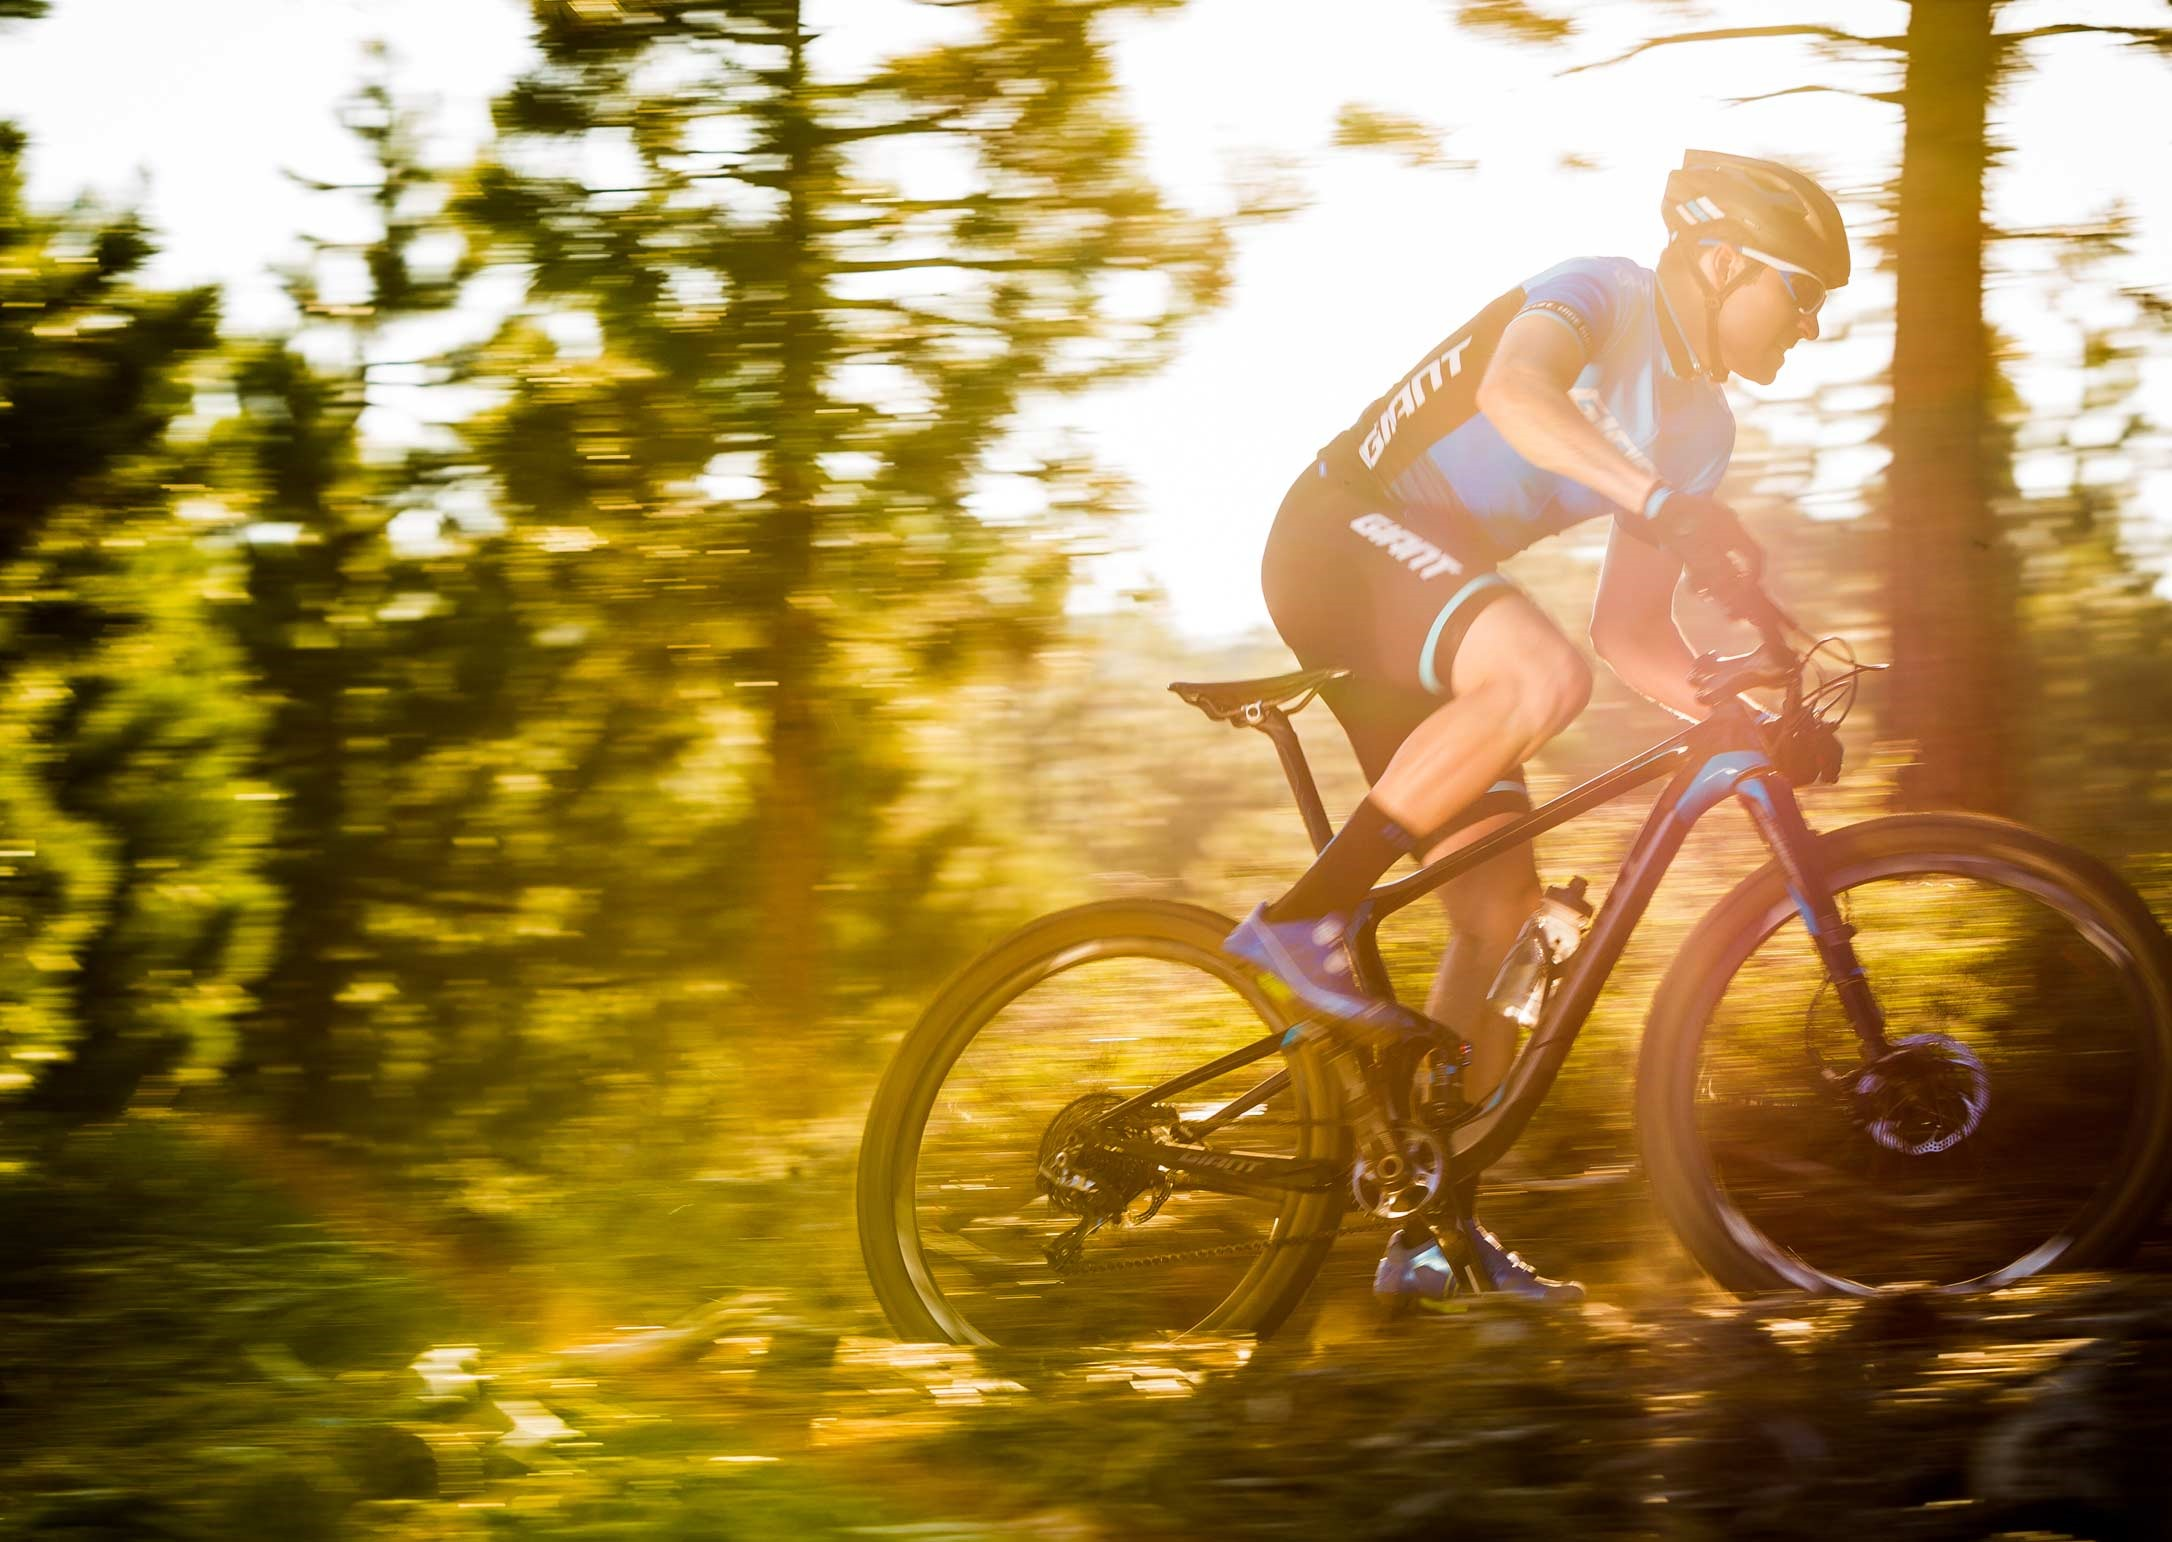 2016 Giant Anthem 27.5 3 wins MBR best £1500 trail bike test!